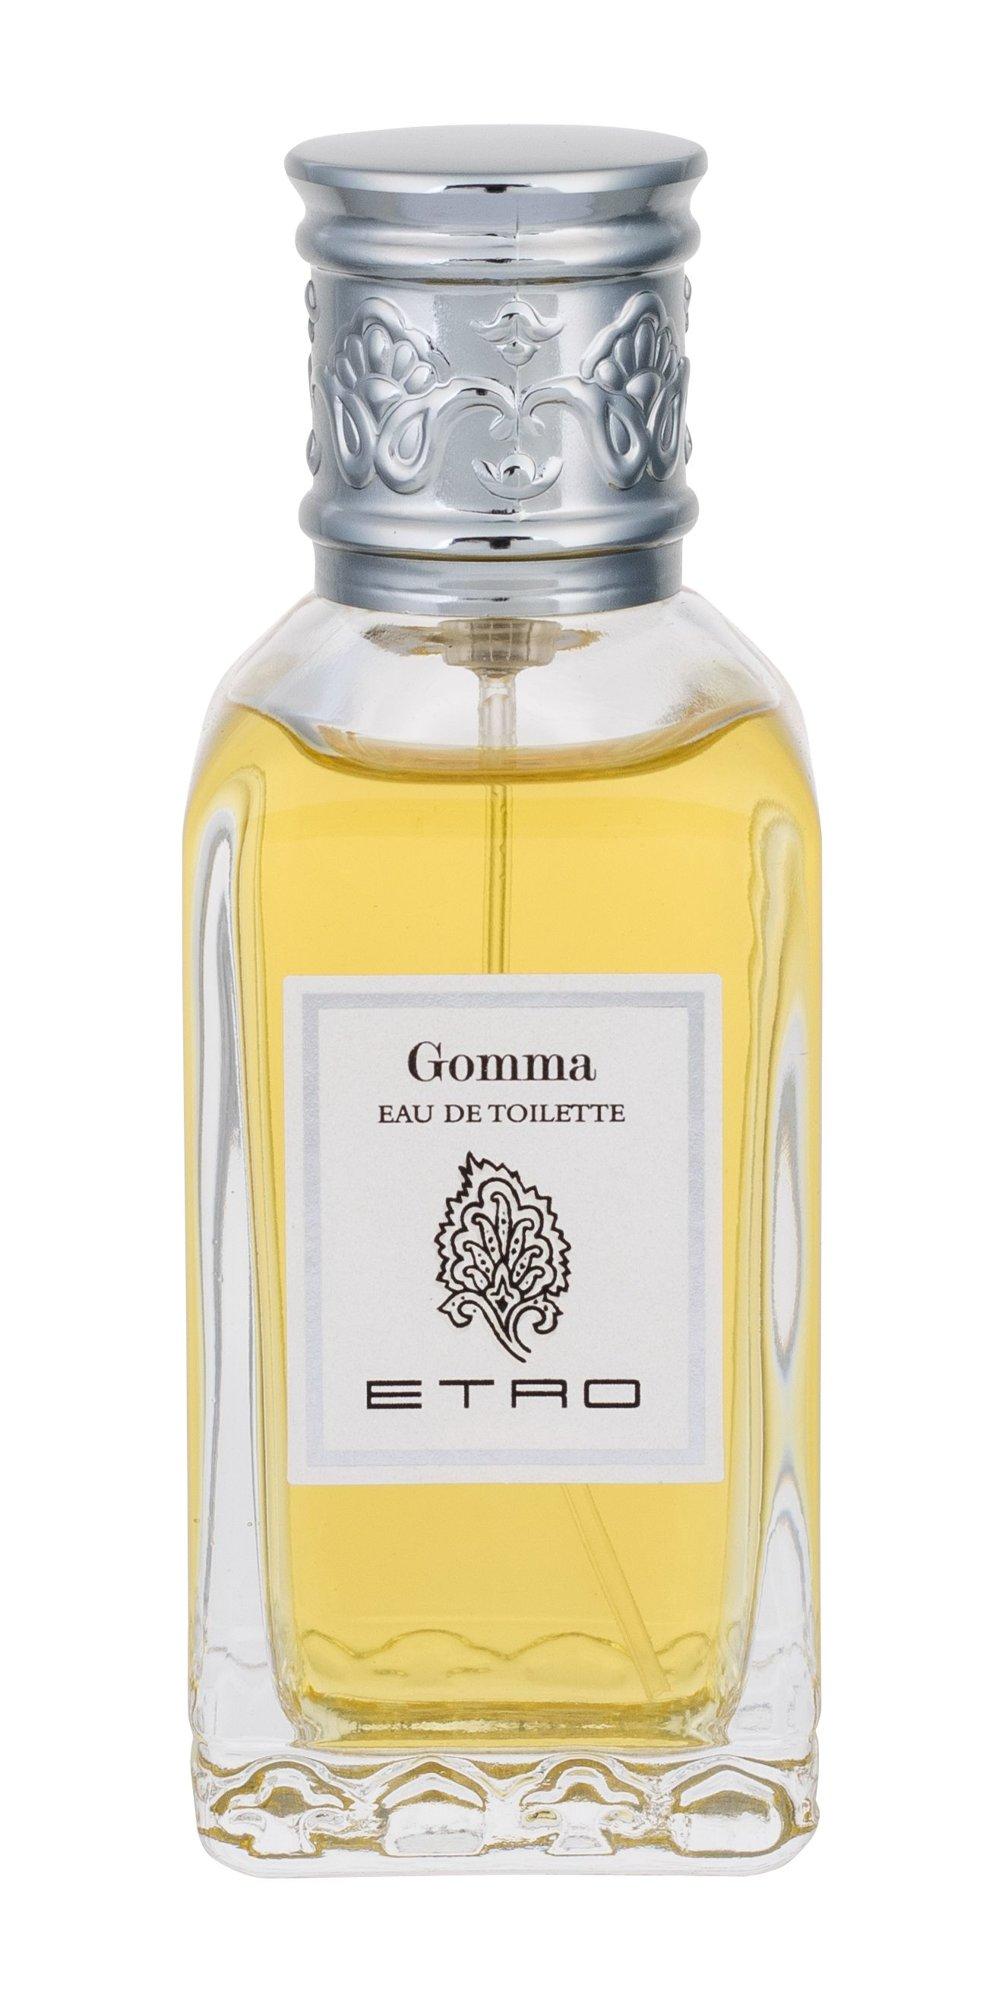 ETRO Gomma EDT 50ml